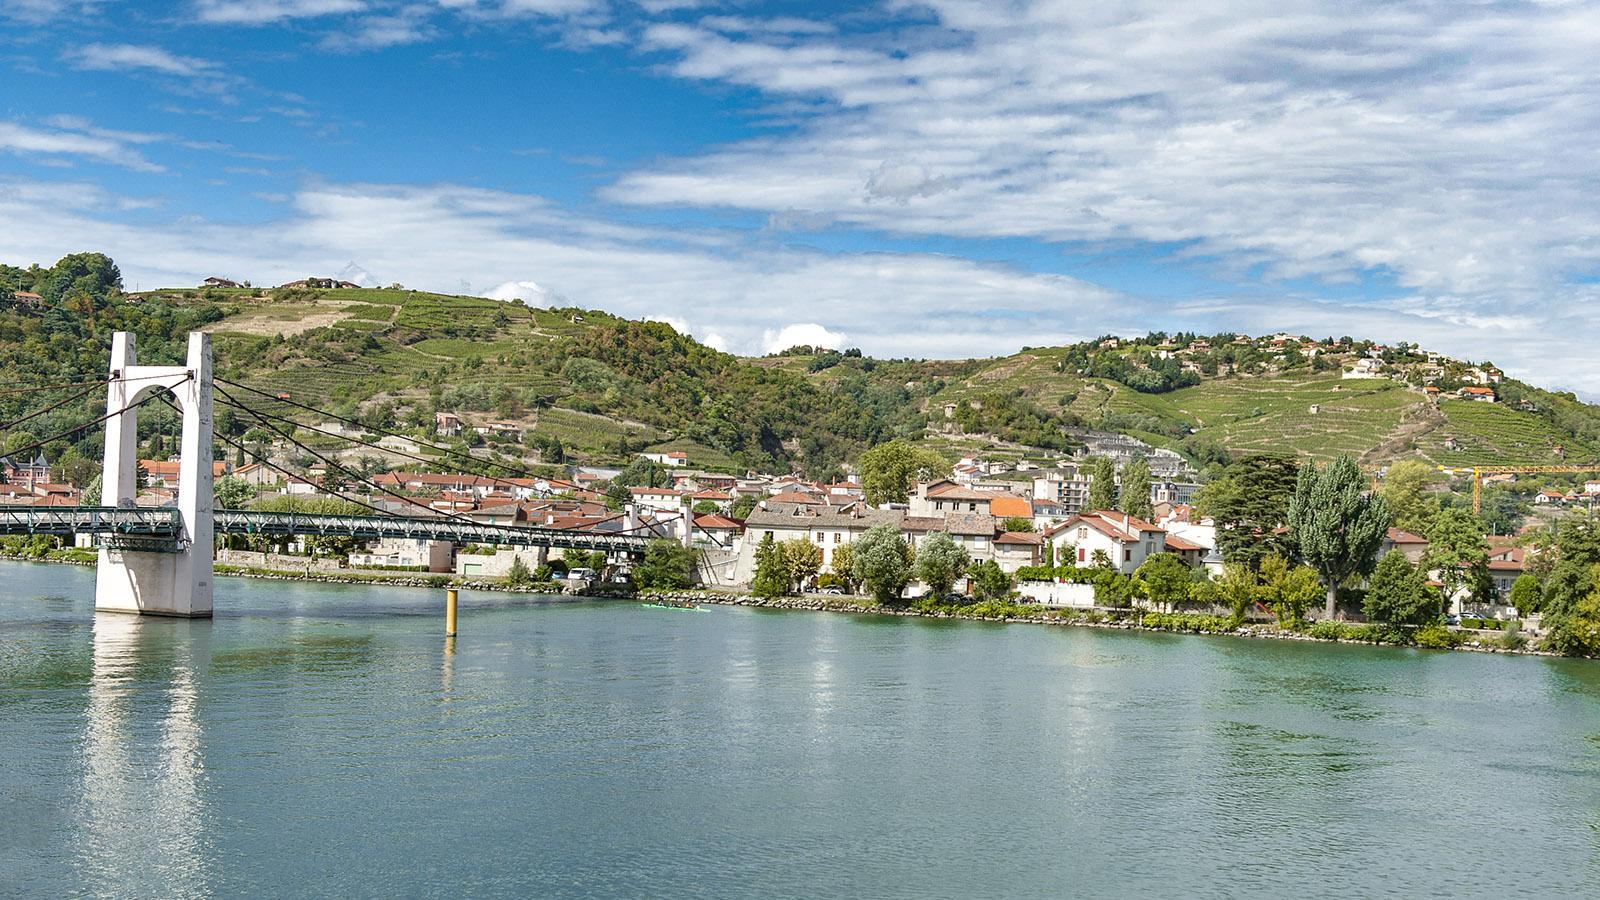 Das Winzerdorf Condrieu an der Rhône. Foto: Hilke Maunder